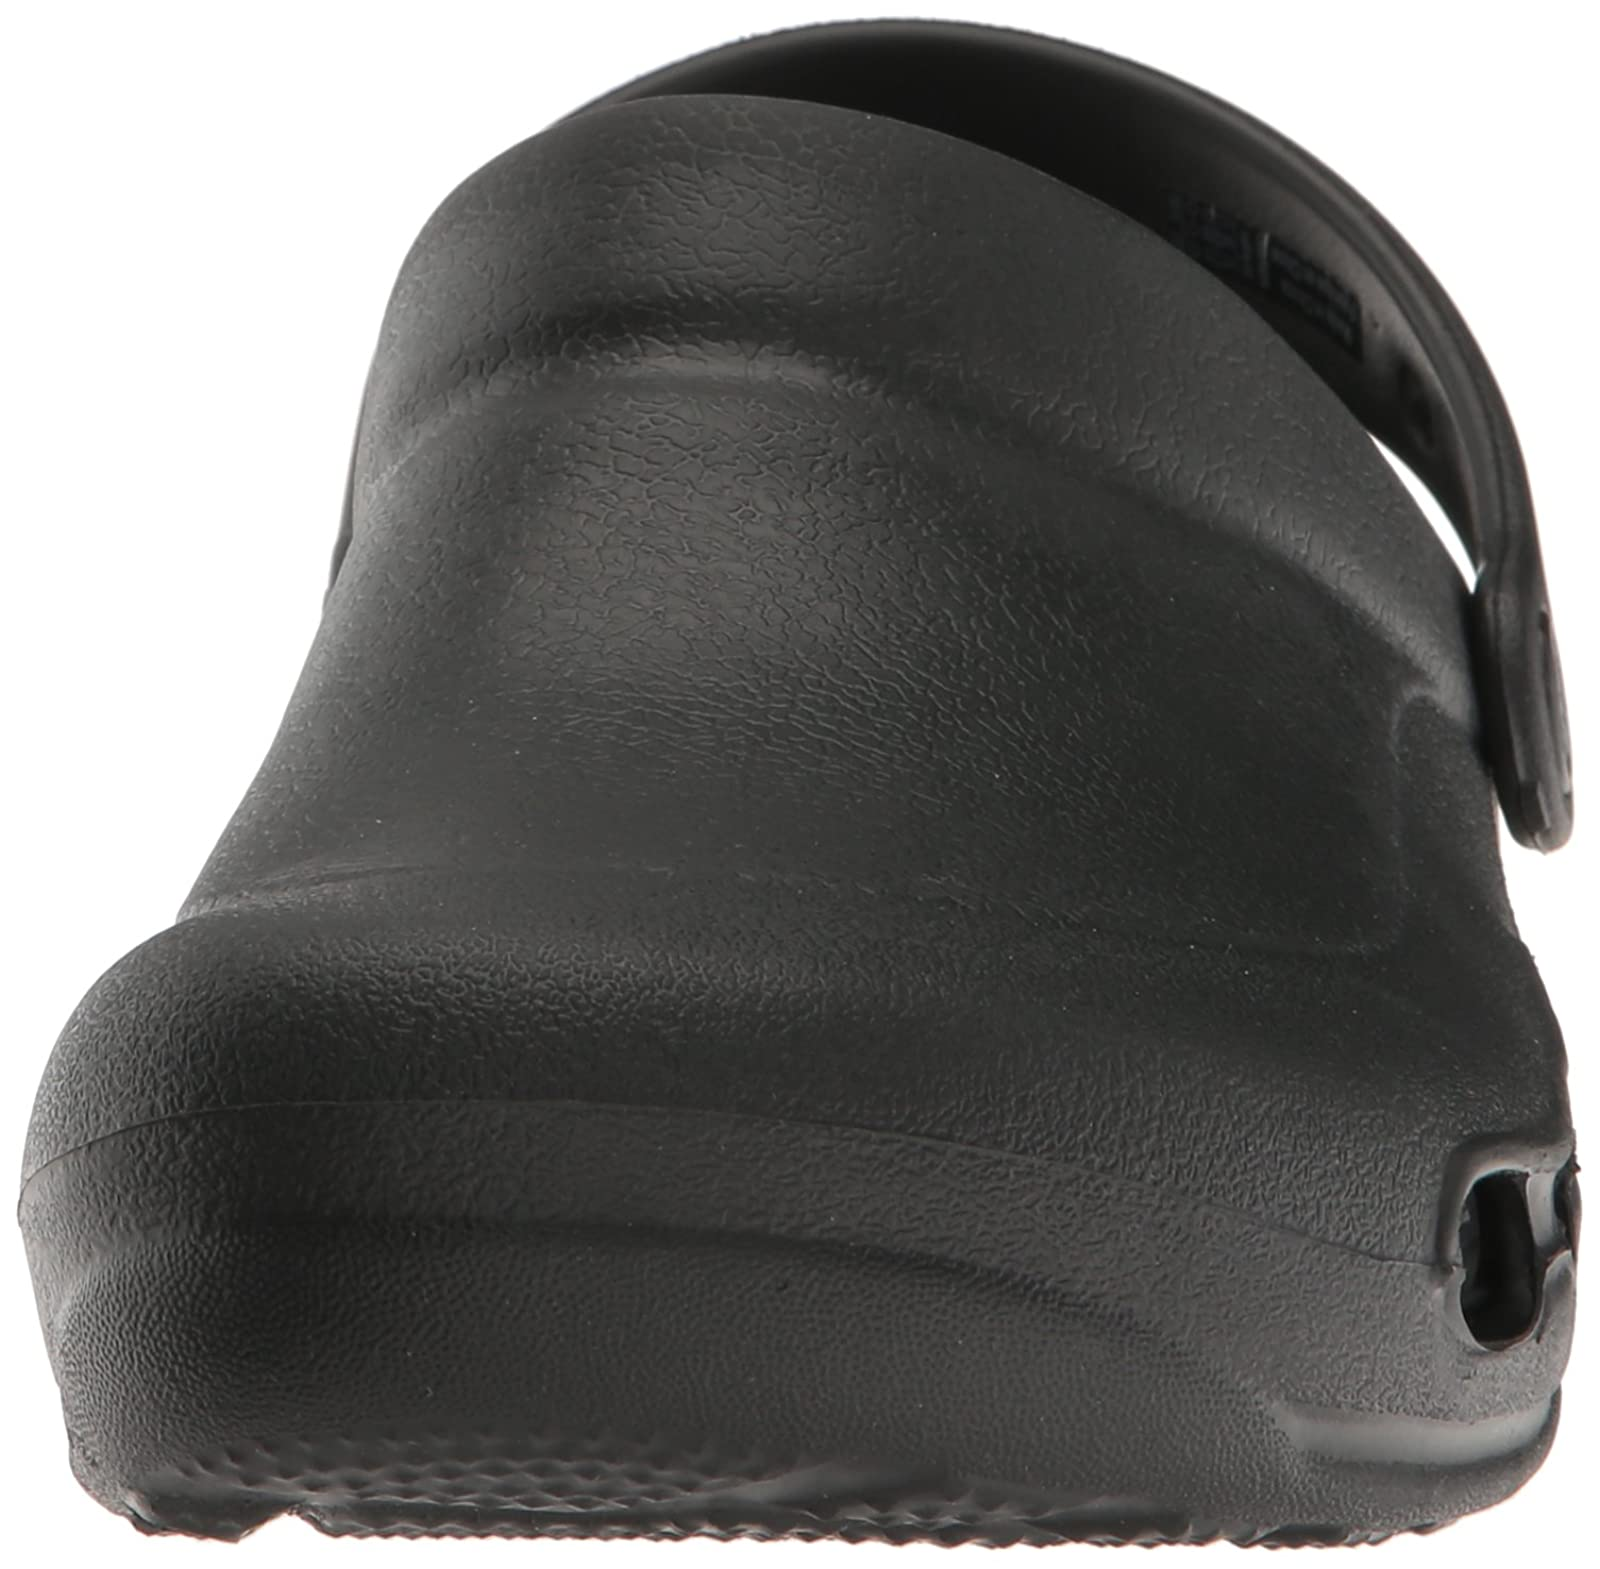 Crocs Unisex Specialist Vent Clog Black 11 10074M Black - 4